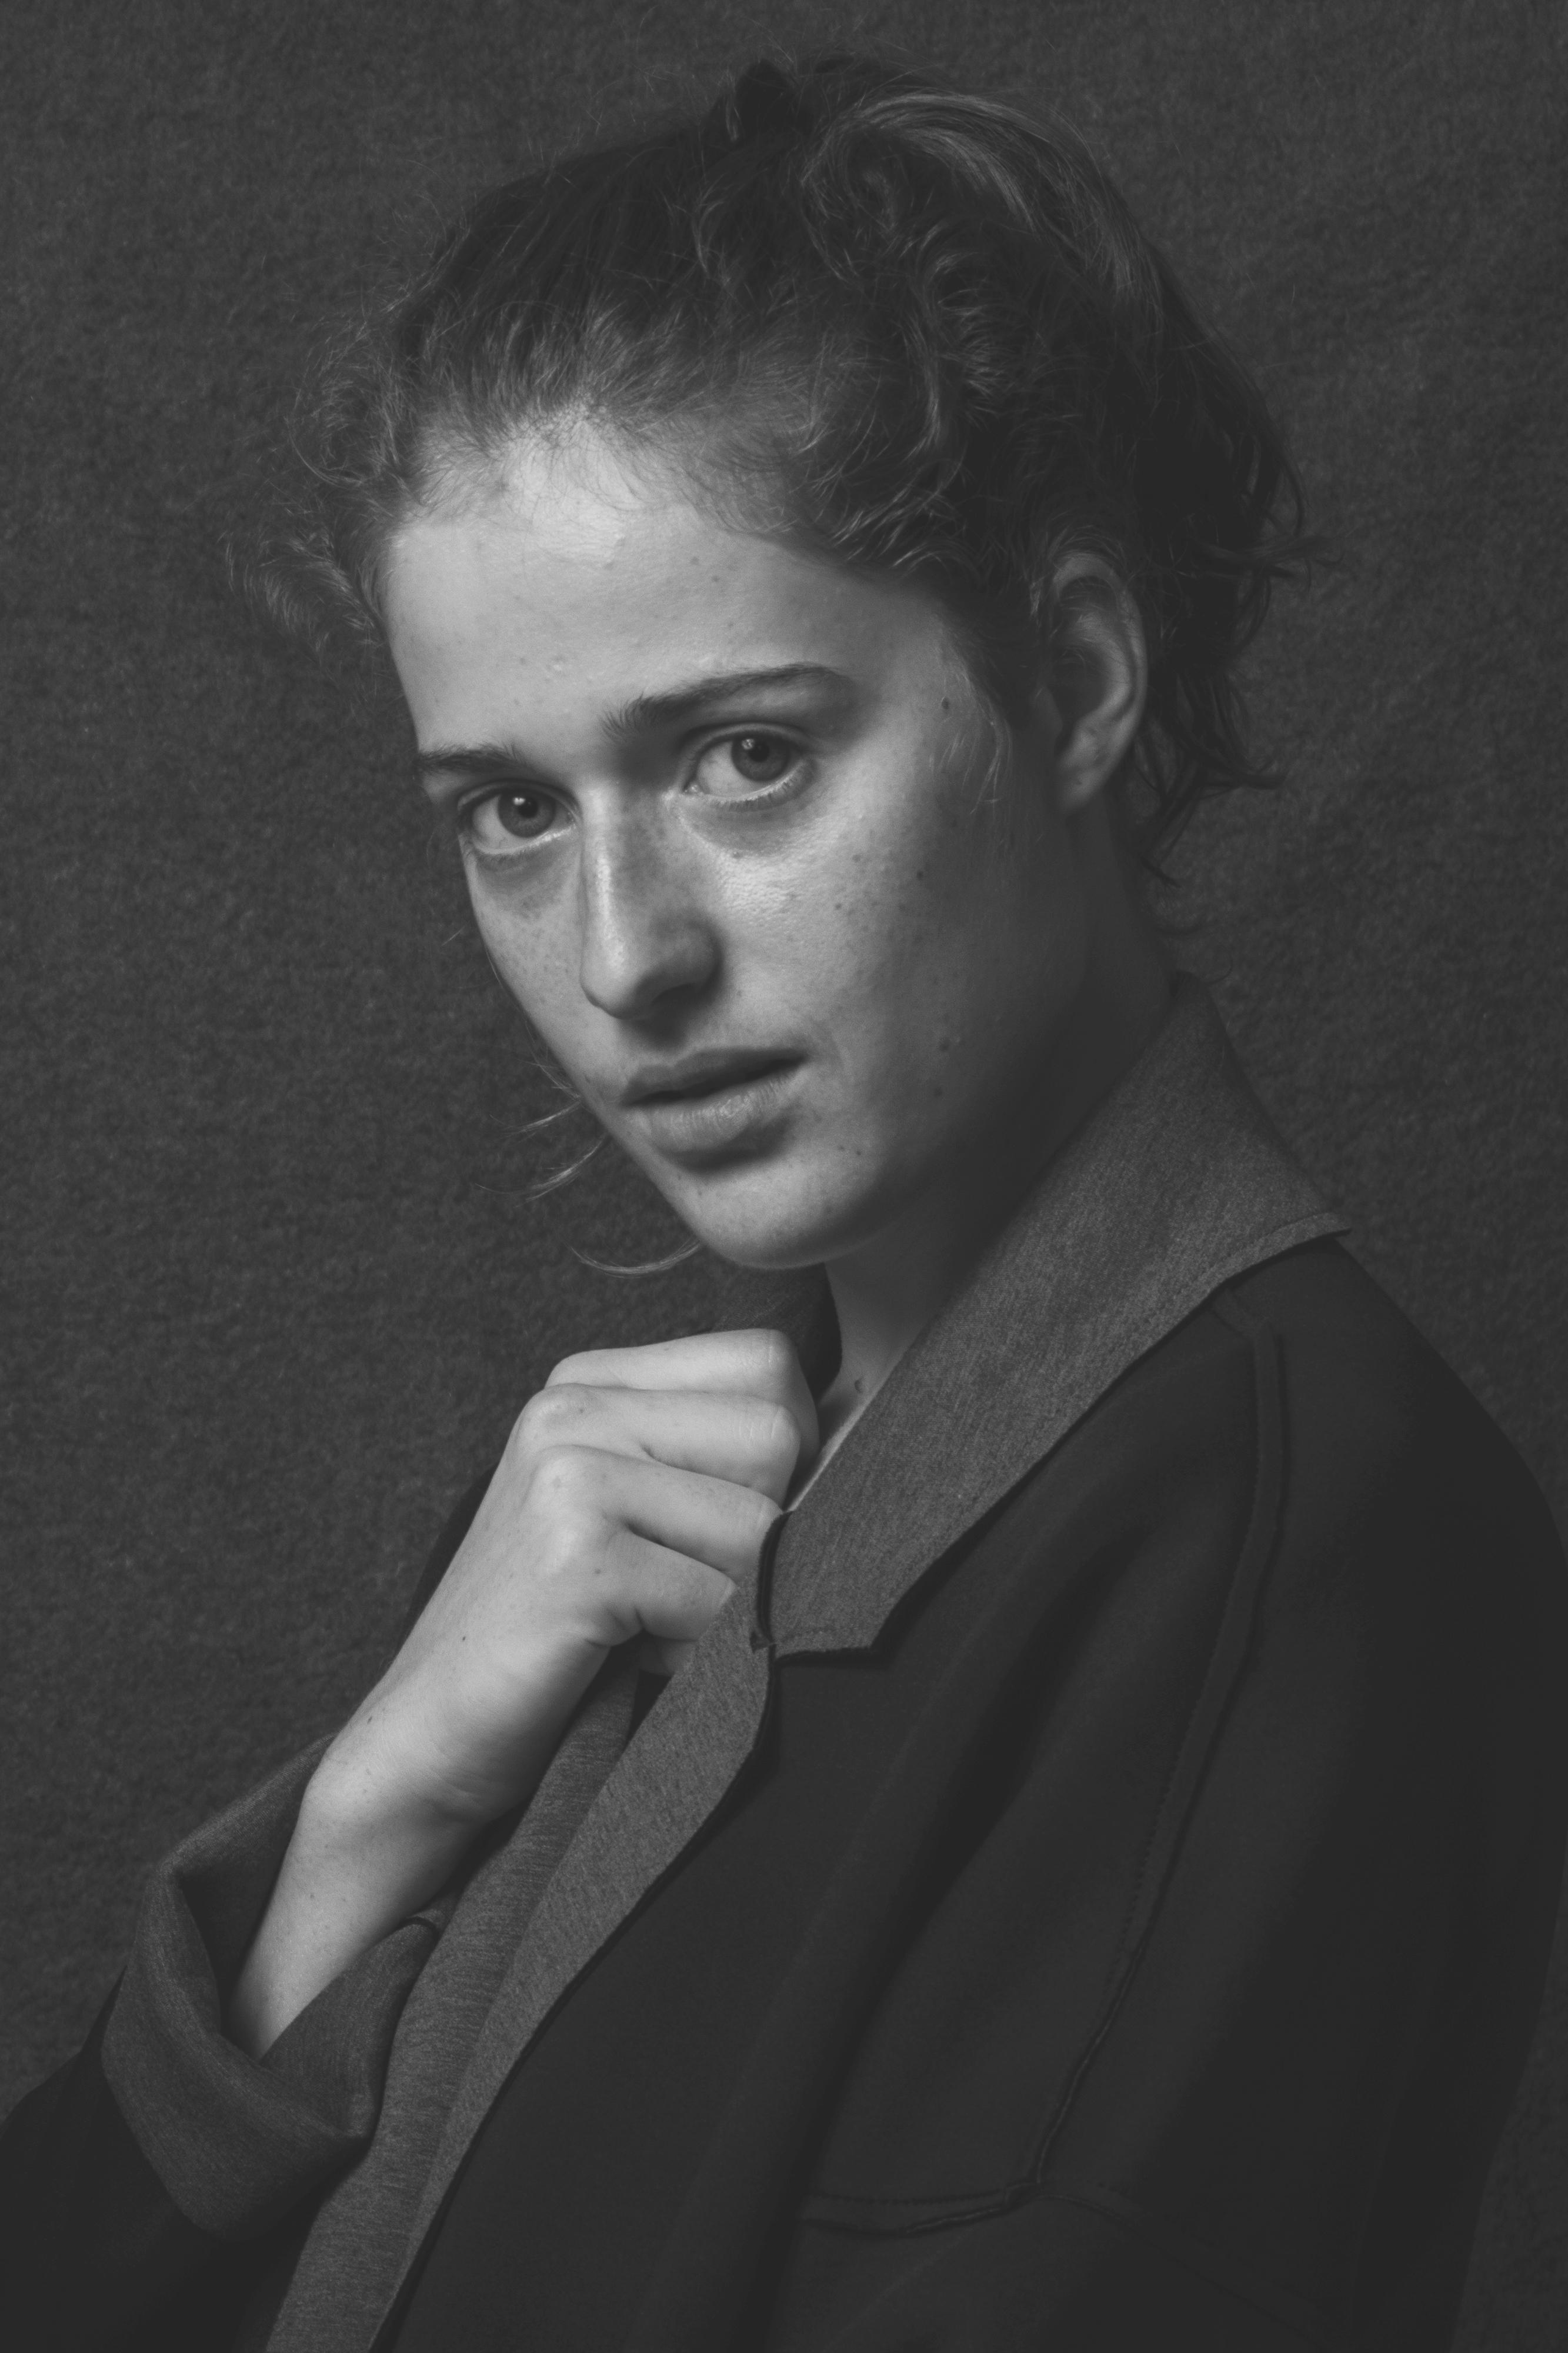 Photography © 2018 Christoph Marti